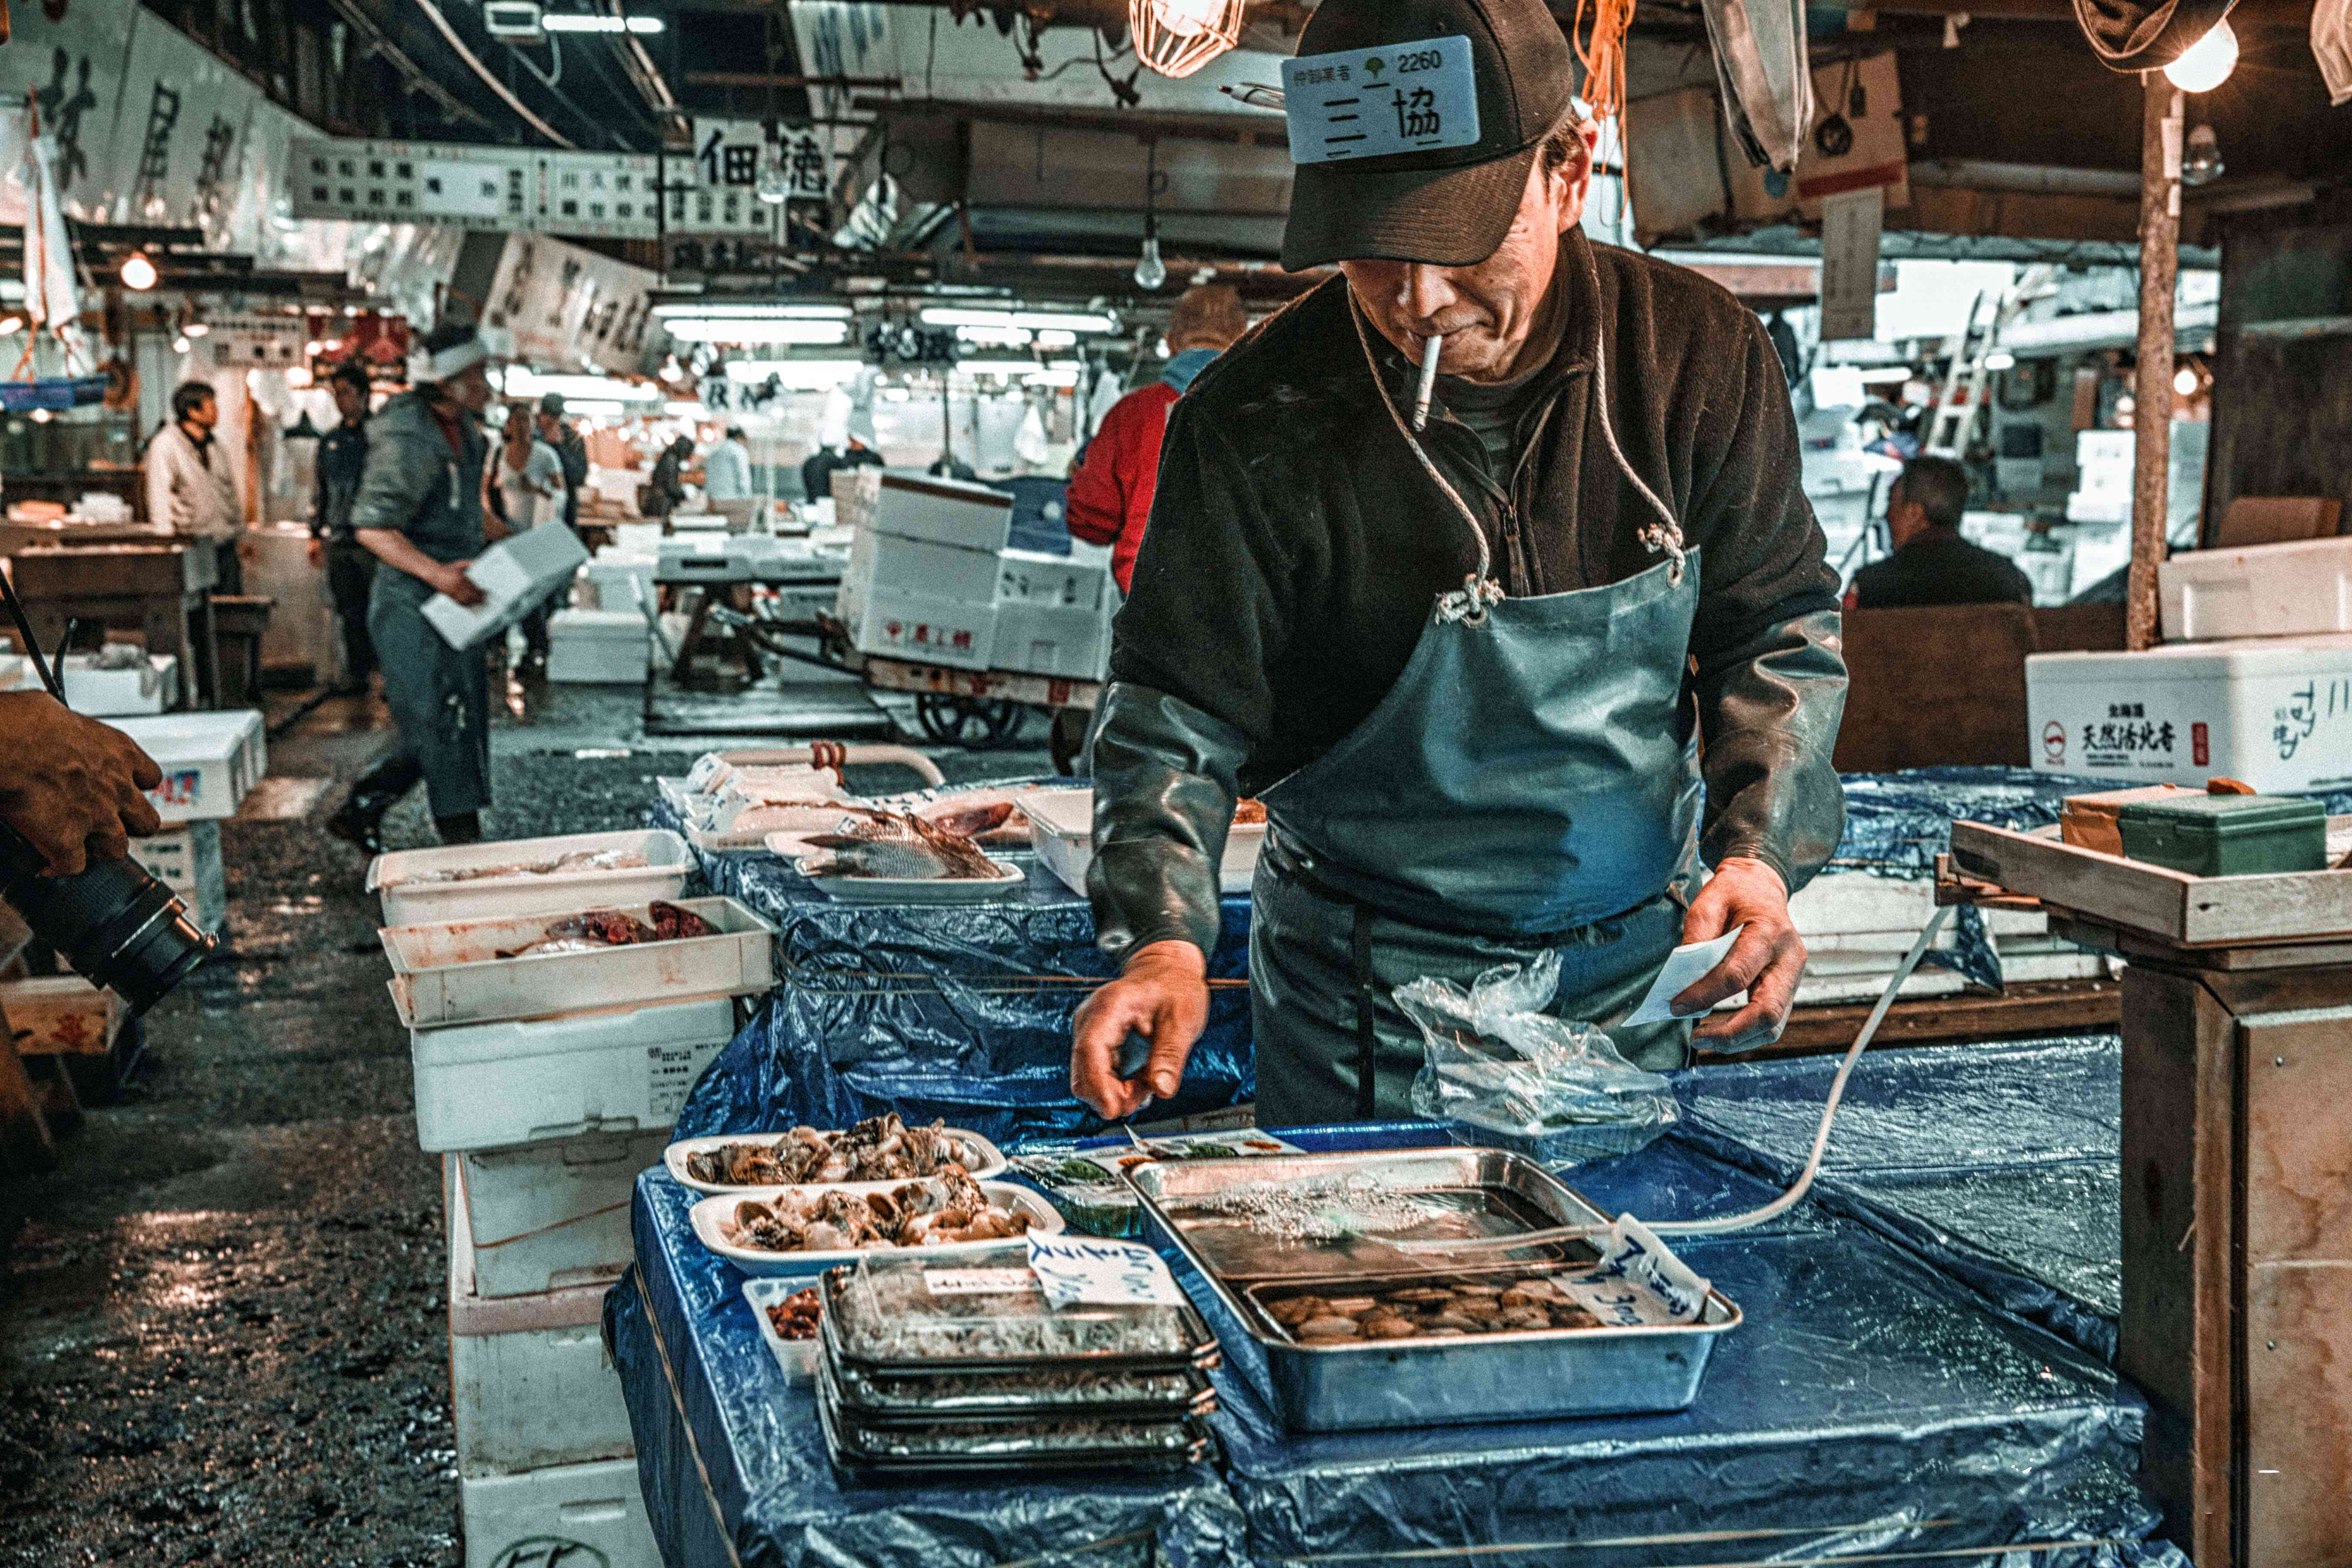 A man laying out fresh fish